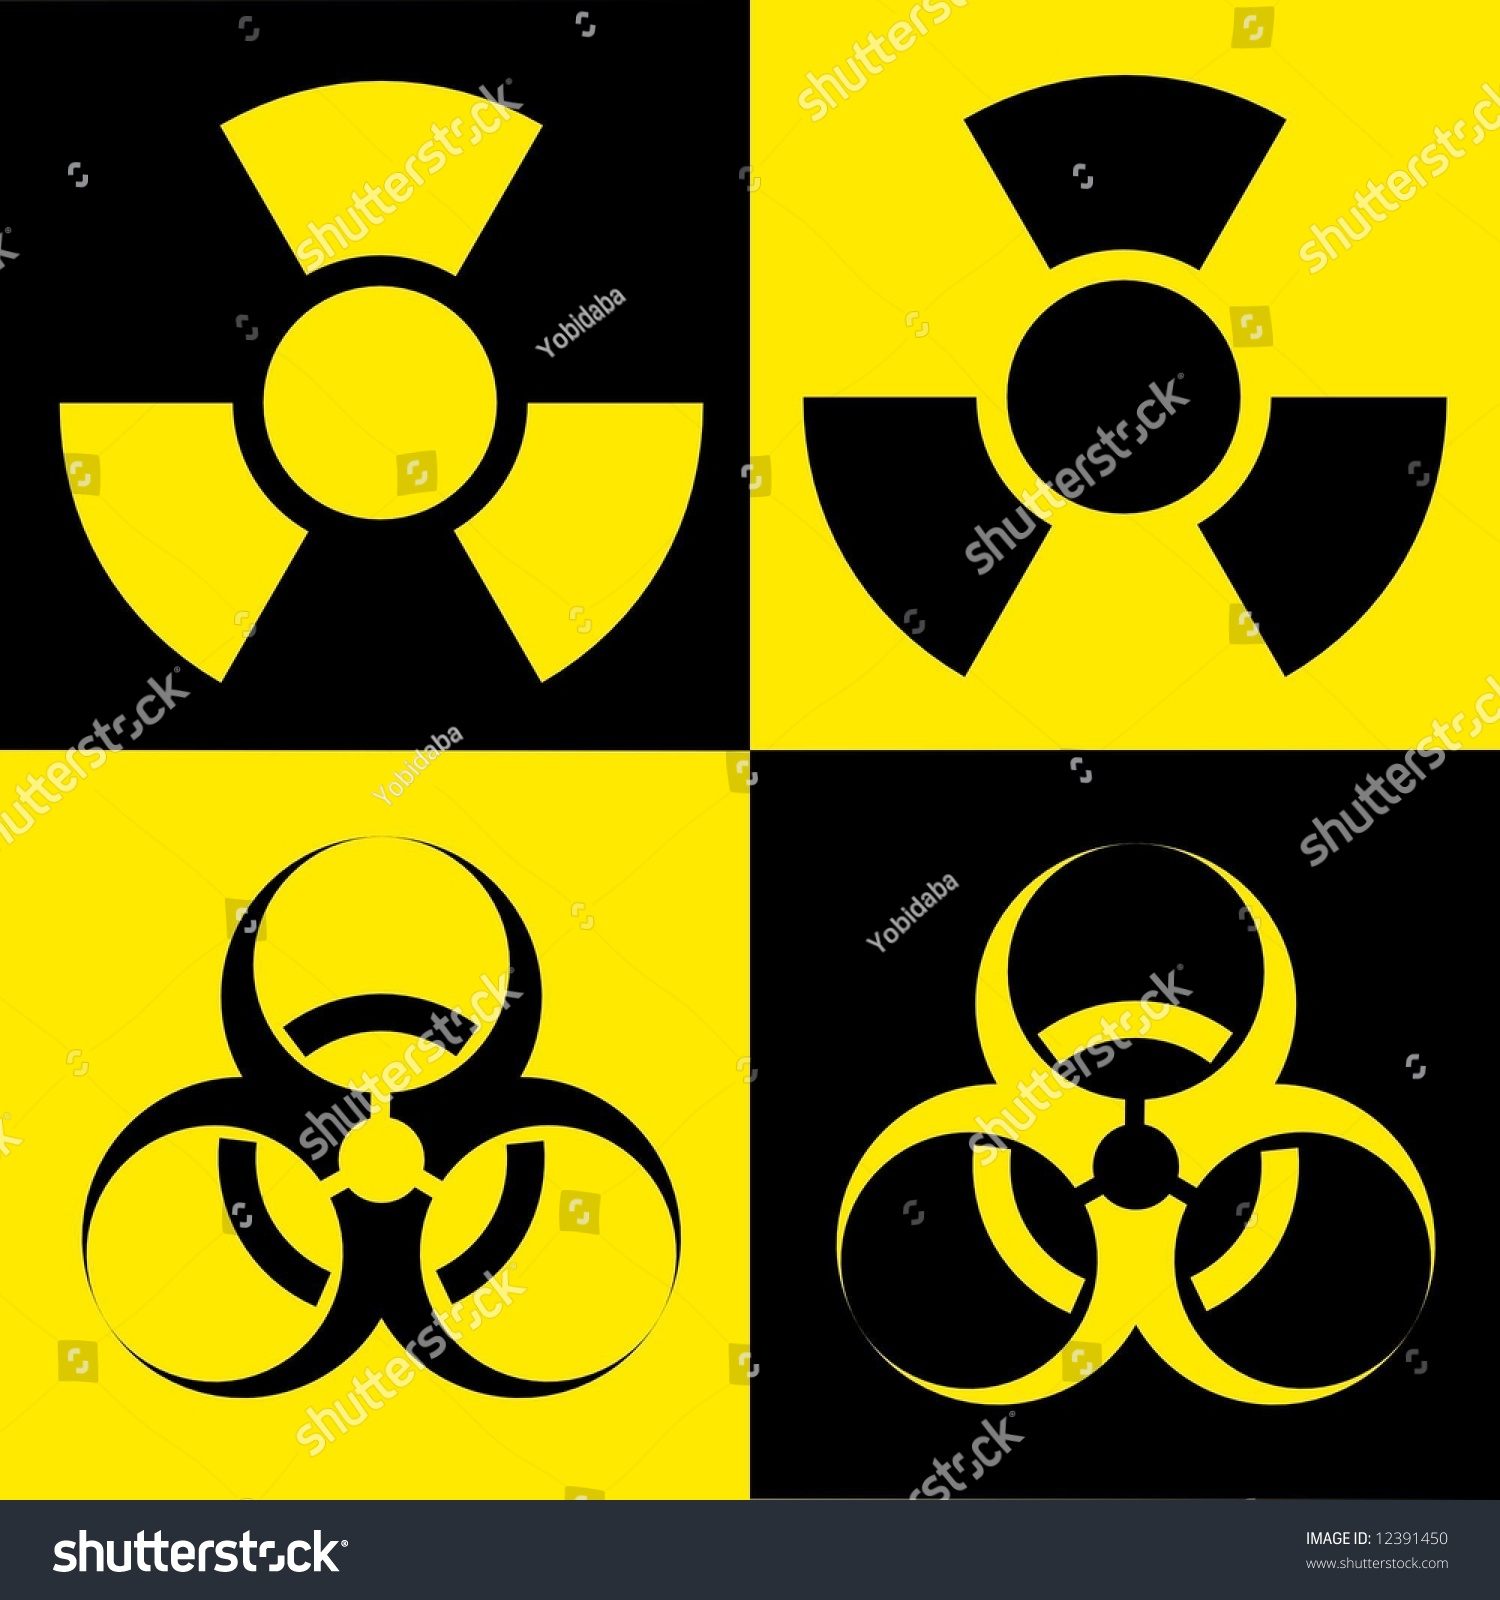 Infectious waste symbol choice image symbol and sign ideas infectious waste symbol image collections symbol and sign ideas image gallery infectious waste symbol green biohazard biocorpaavc